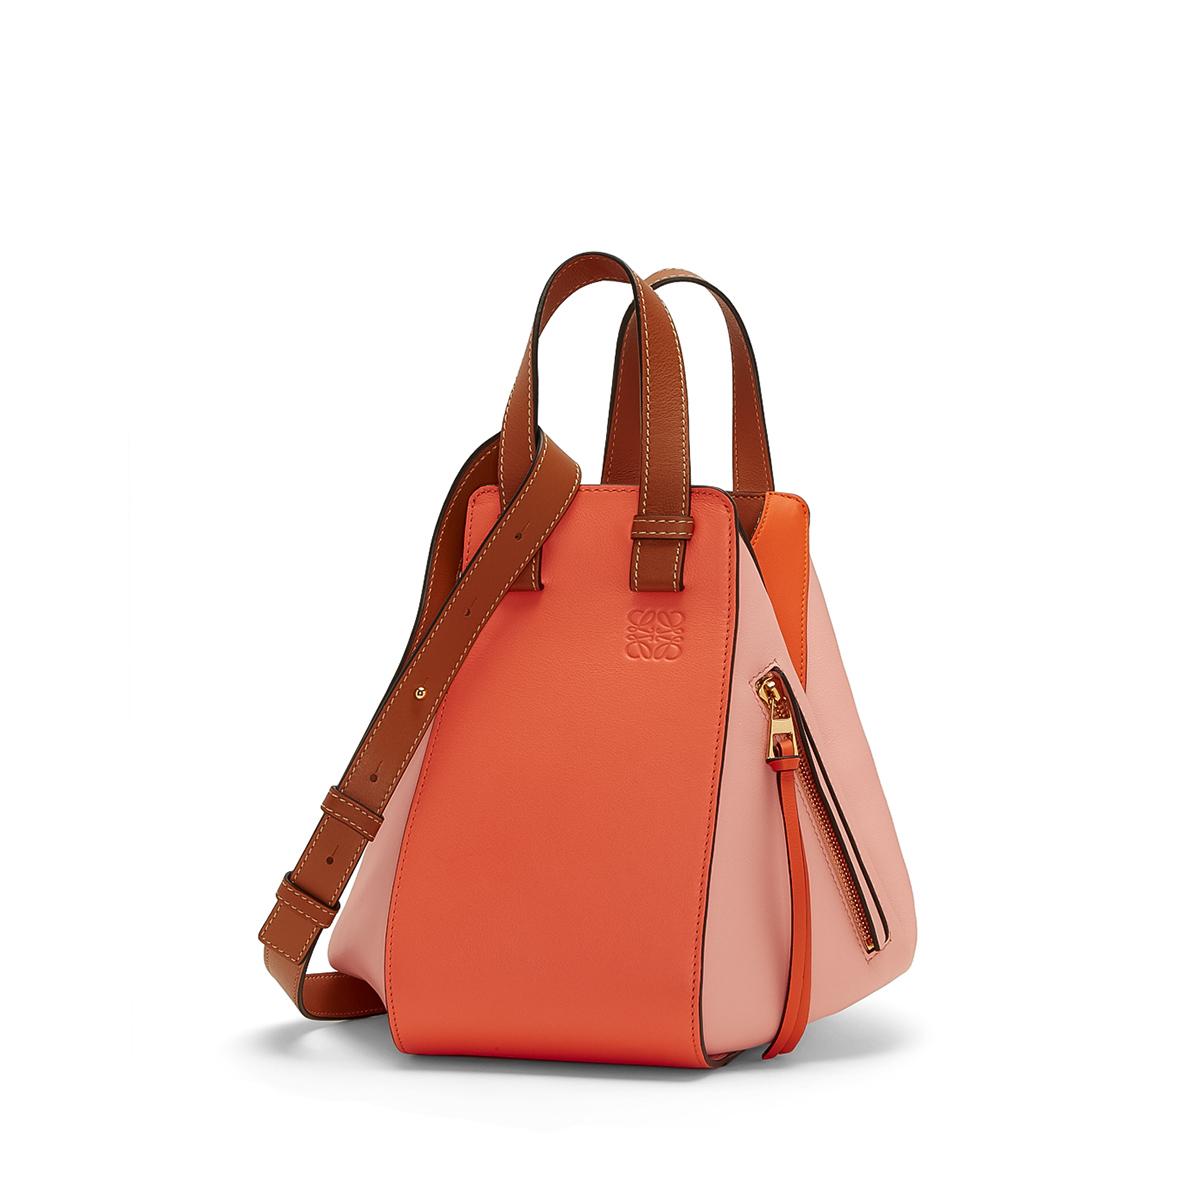 Hammock Small Bag Blossom Bright Peach Loewe